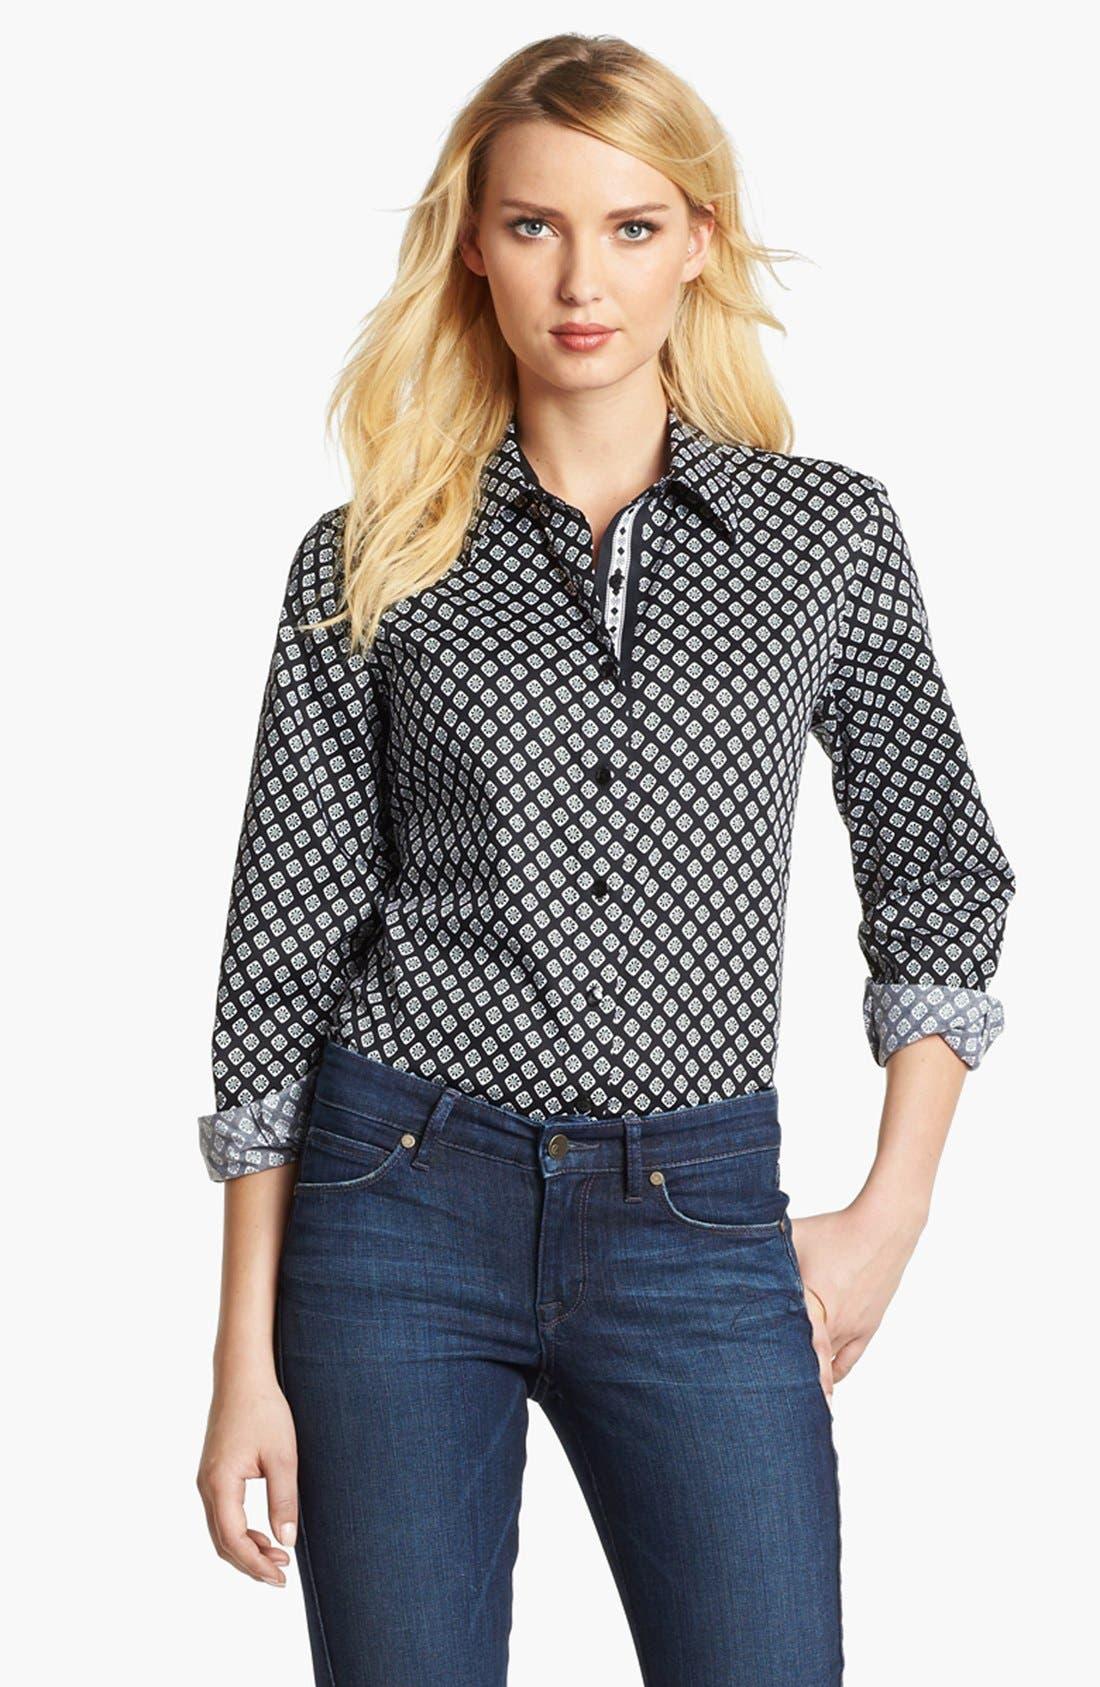 Alternate Image 1 Selected - Foxcroft Foulard Print Shirt (Petite)